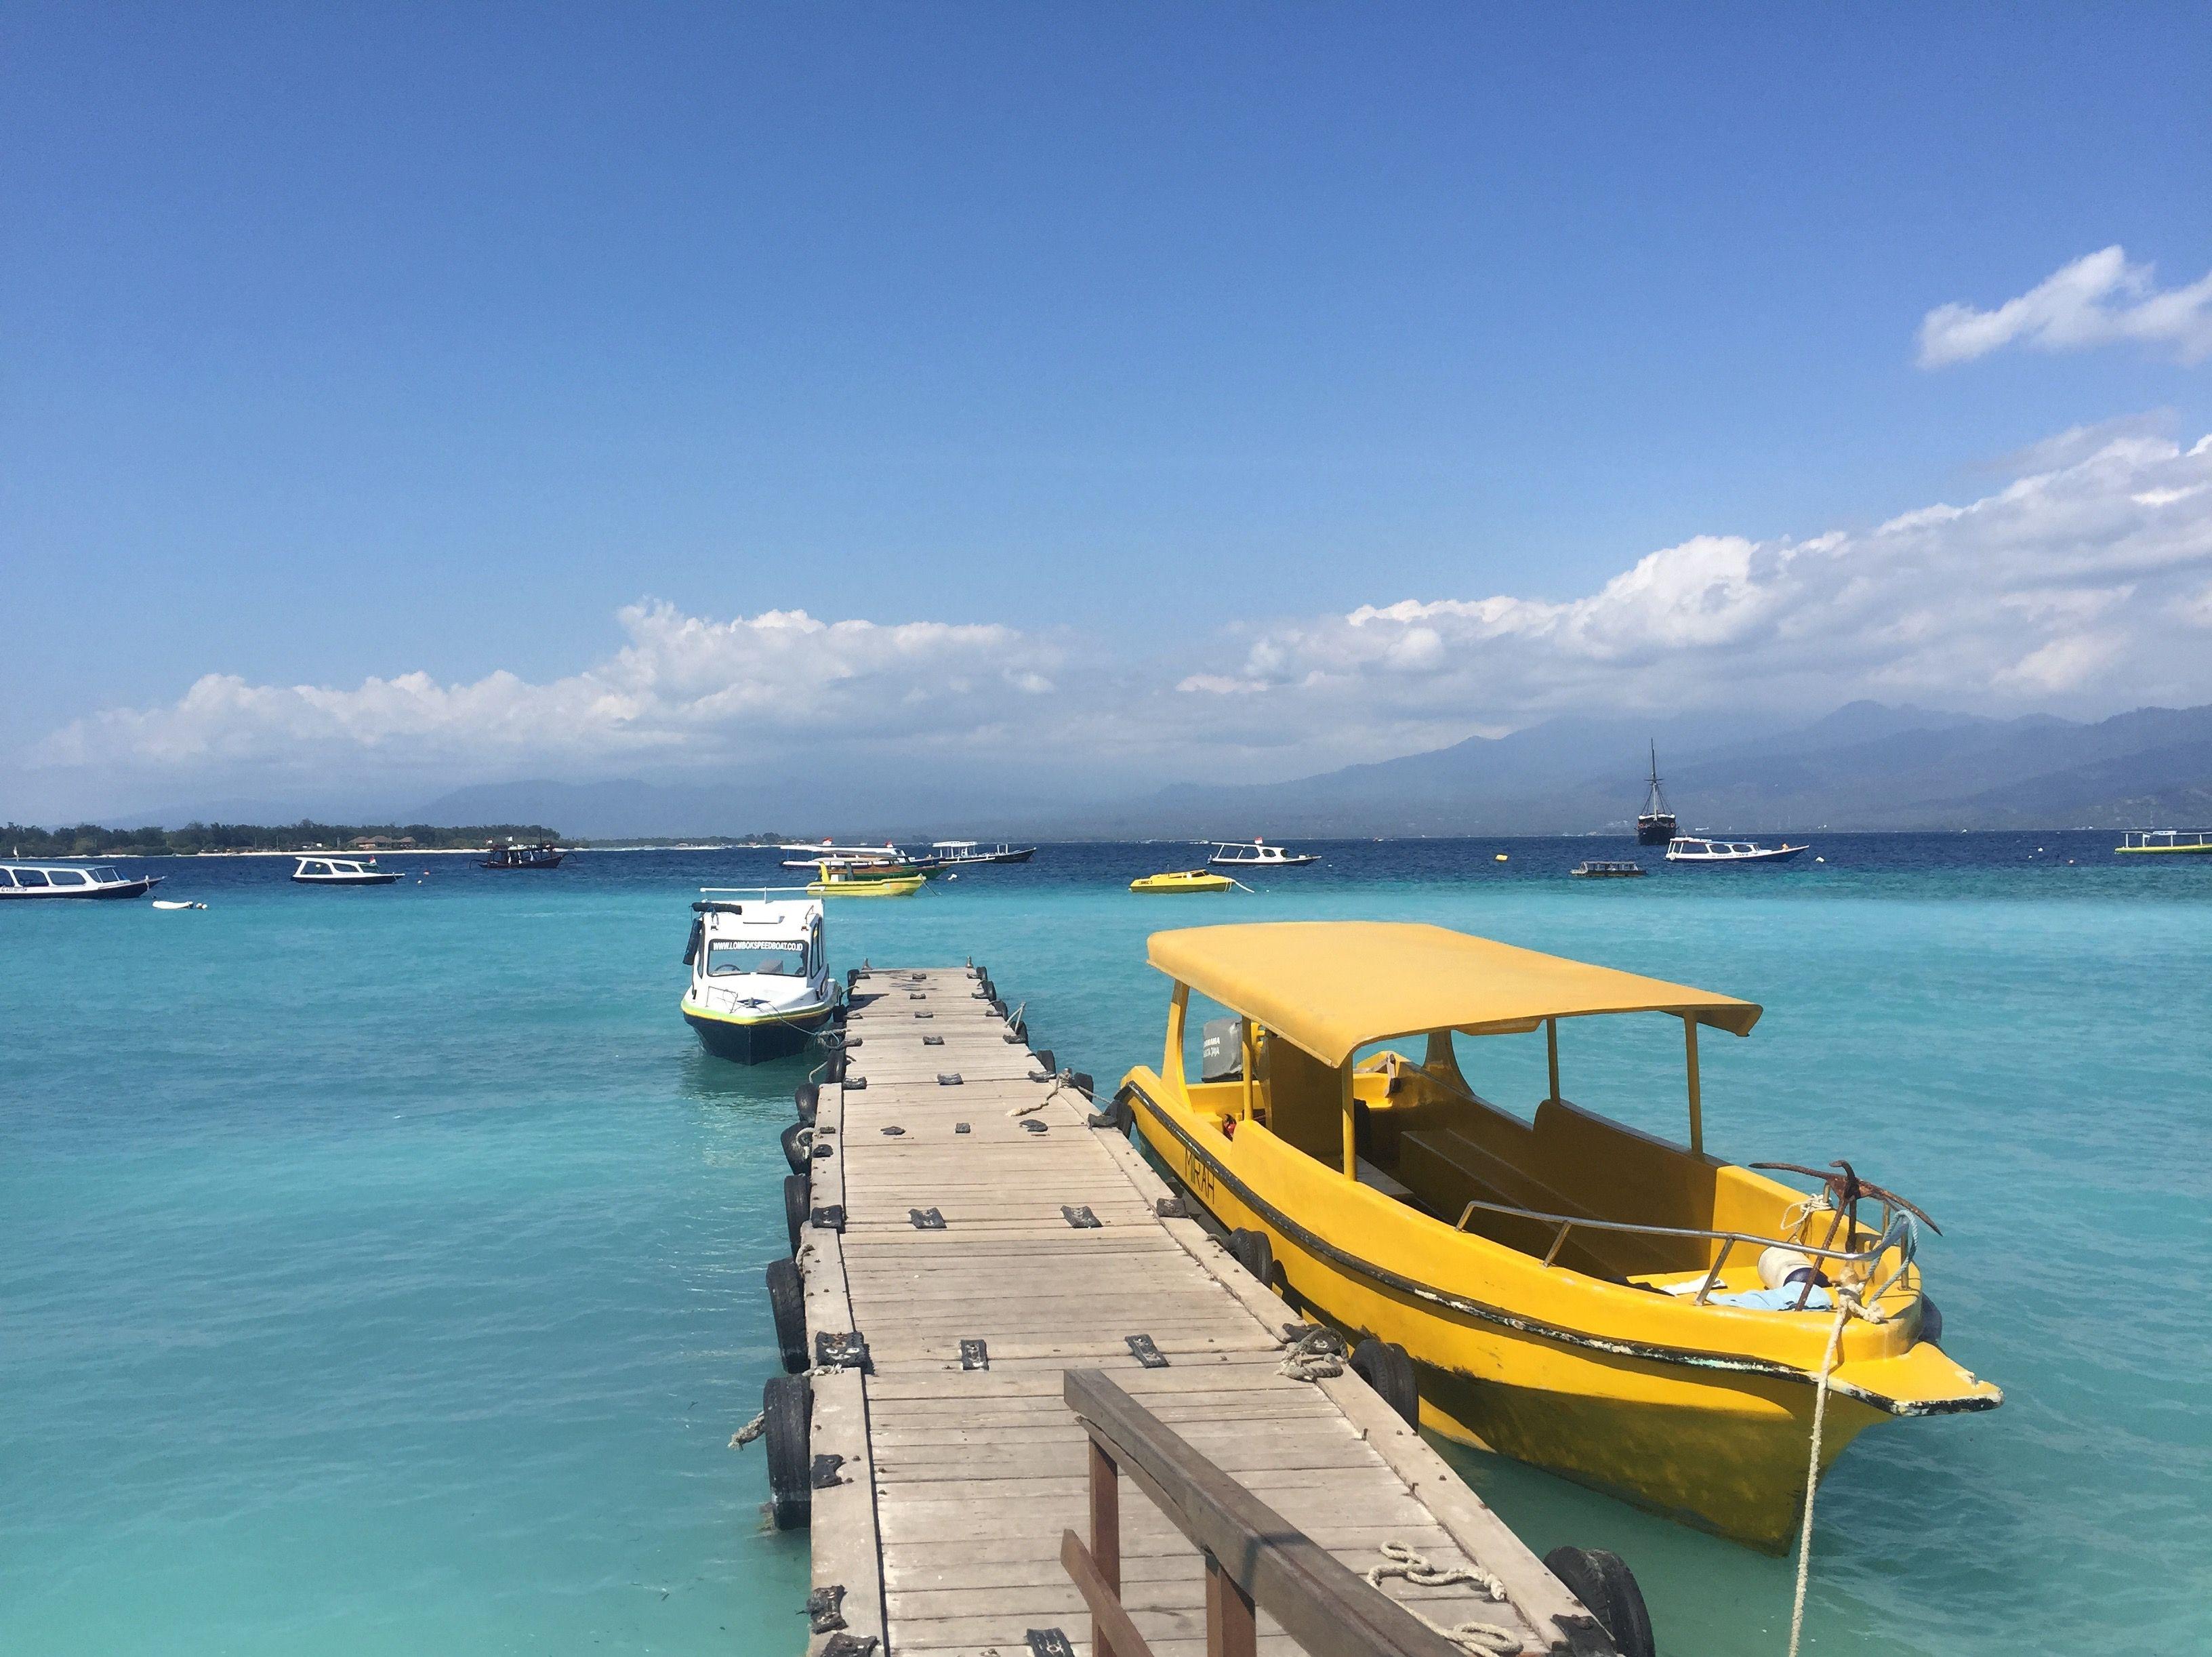 #gili #lombok #bali #indonesia #island #gilitrawangan #beach #travel #sea #gilimeno #love #holiday #trip #nature #snorkeling #boat #ocean #diving #gilit #traveling #giliislands #culture #art #nusapenida #ig #indotravellers #vacation #indo #repost #bhfyp